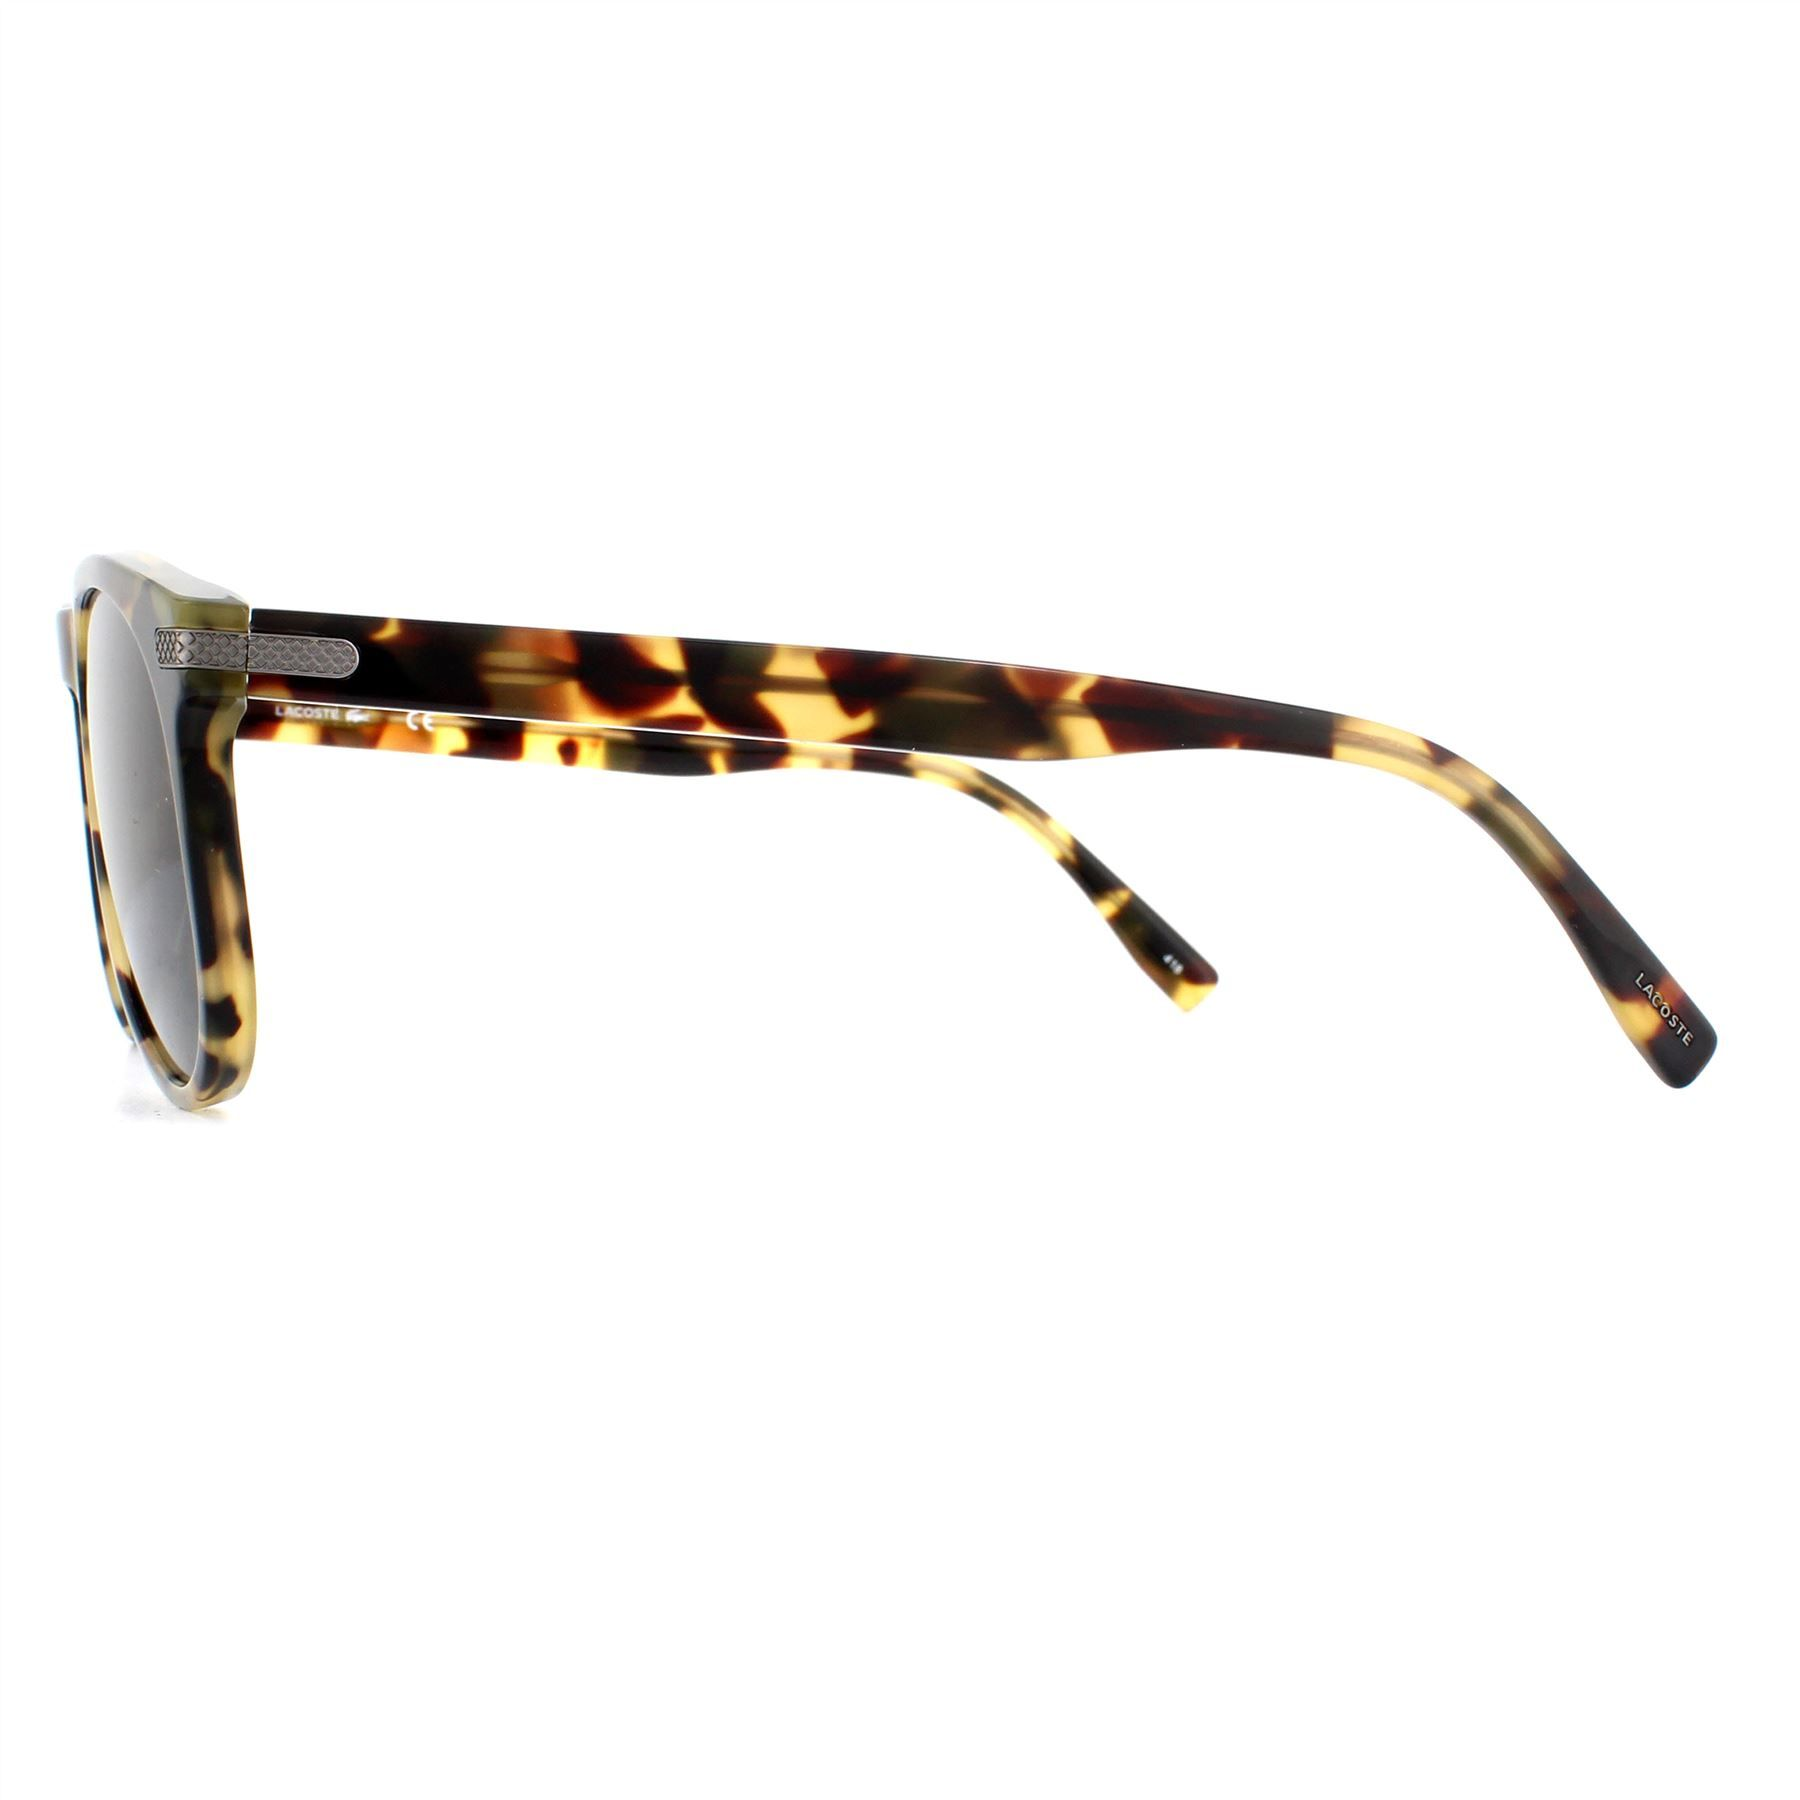 Lacoste Sunglasses L897S 215 Havana Grey